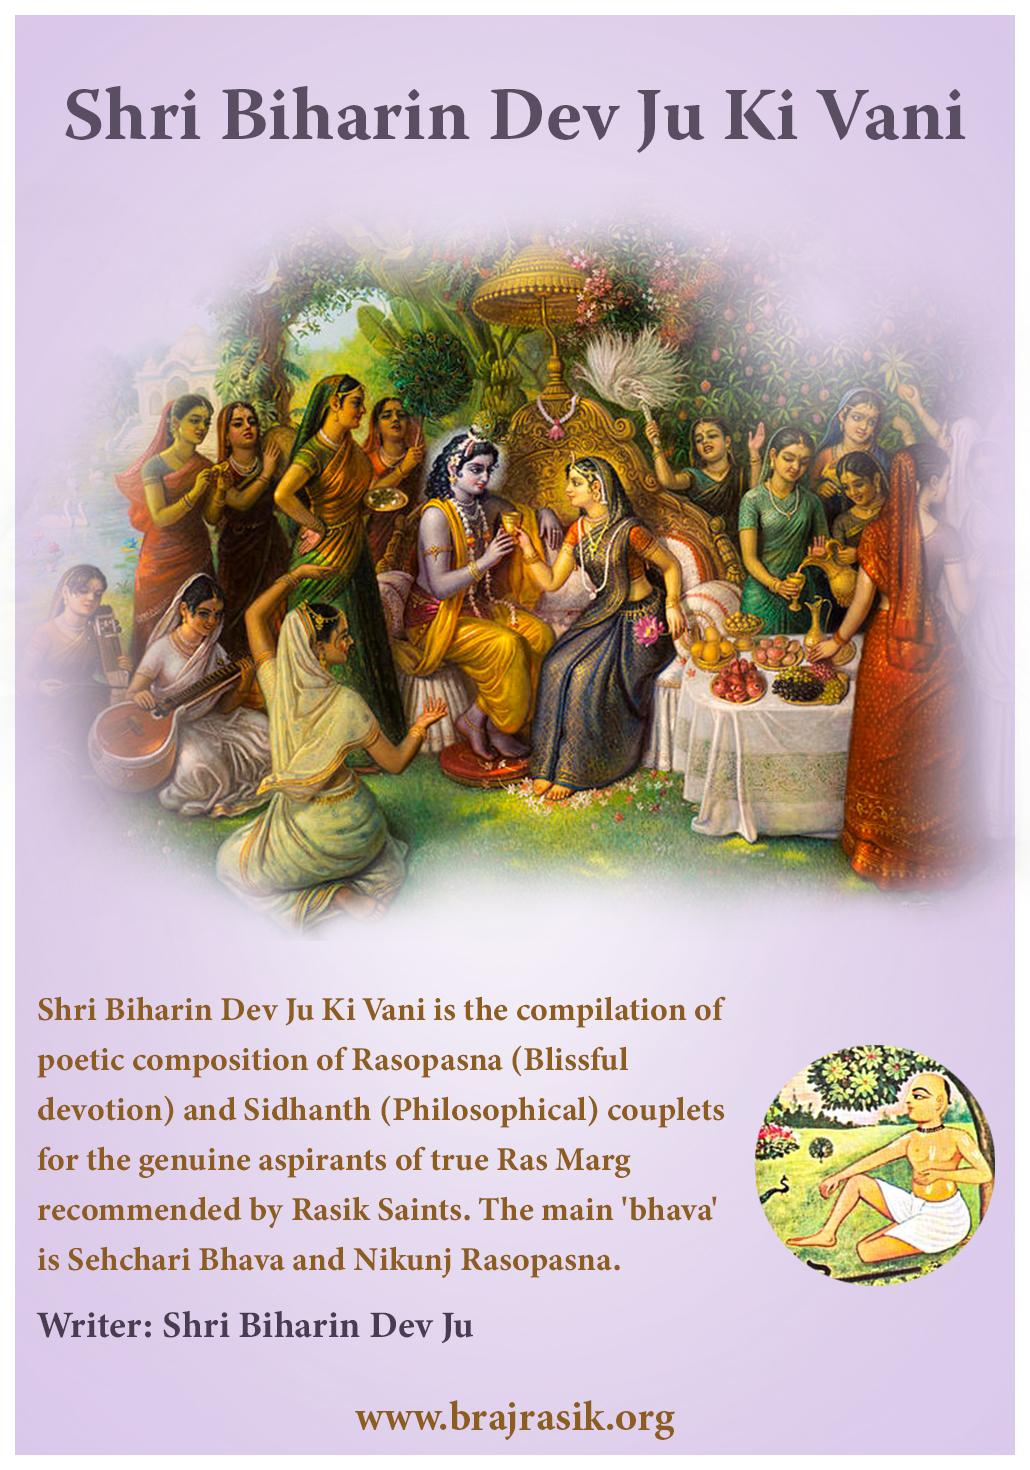 Shri Biharin Dev Ju Ki Vani